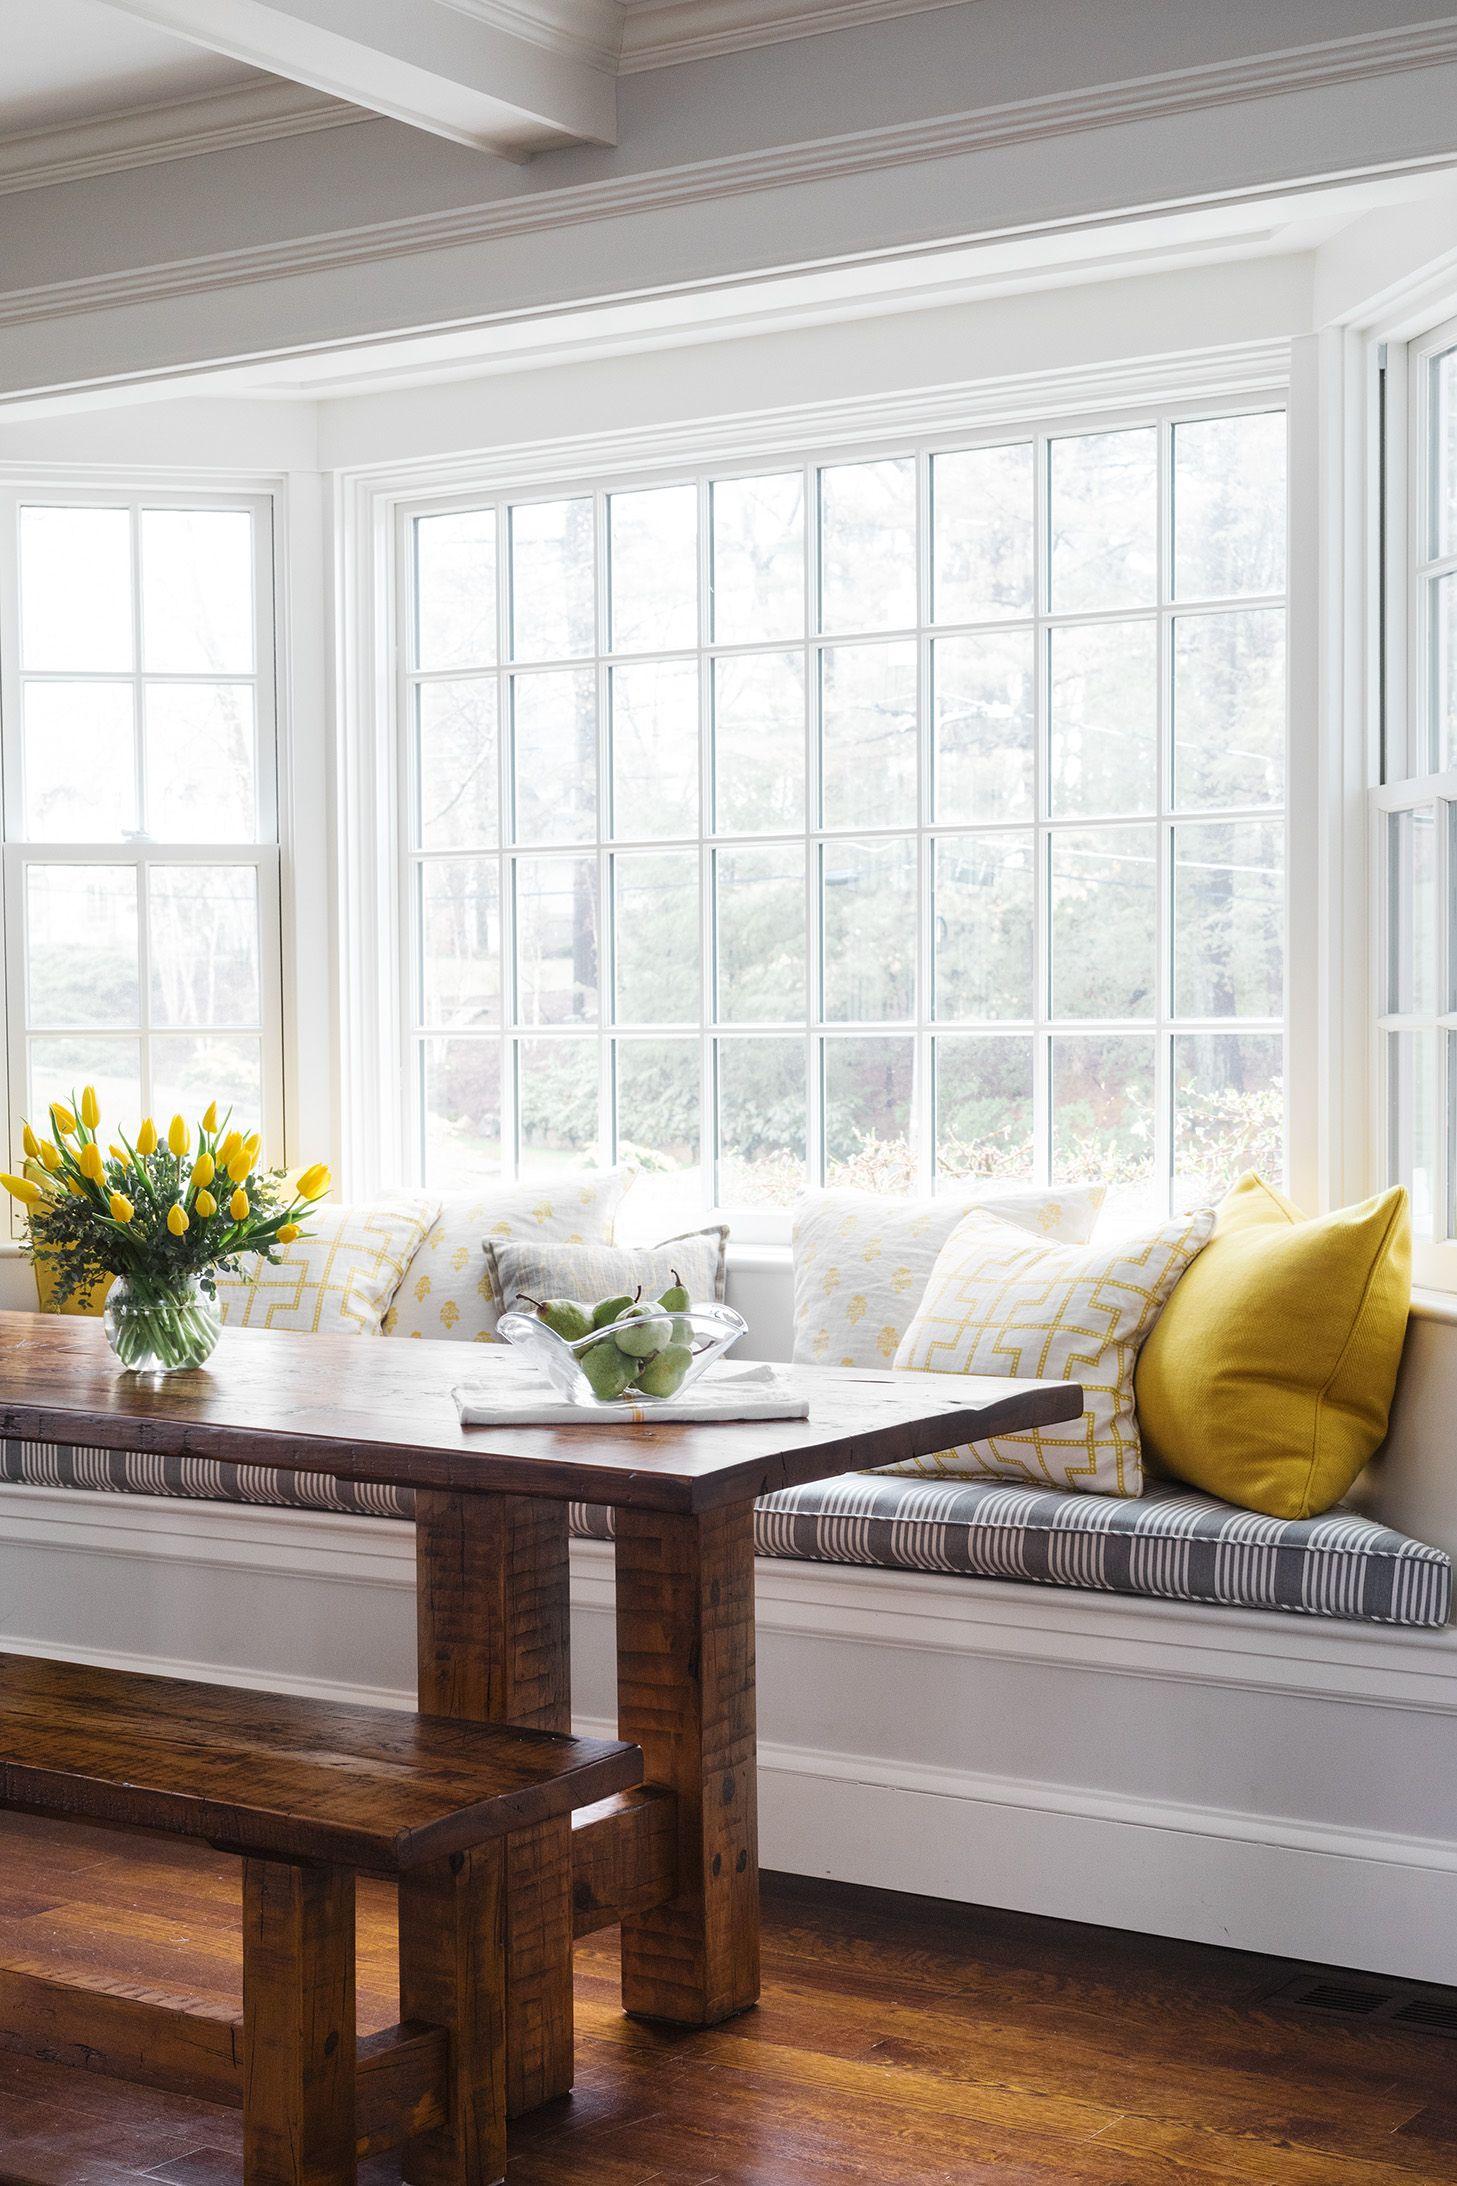 Window Seating Huffard House Interior Design Window Seat Kitchen Dining Room Windows Dining Bench Cushion